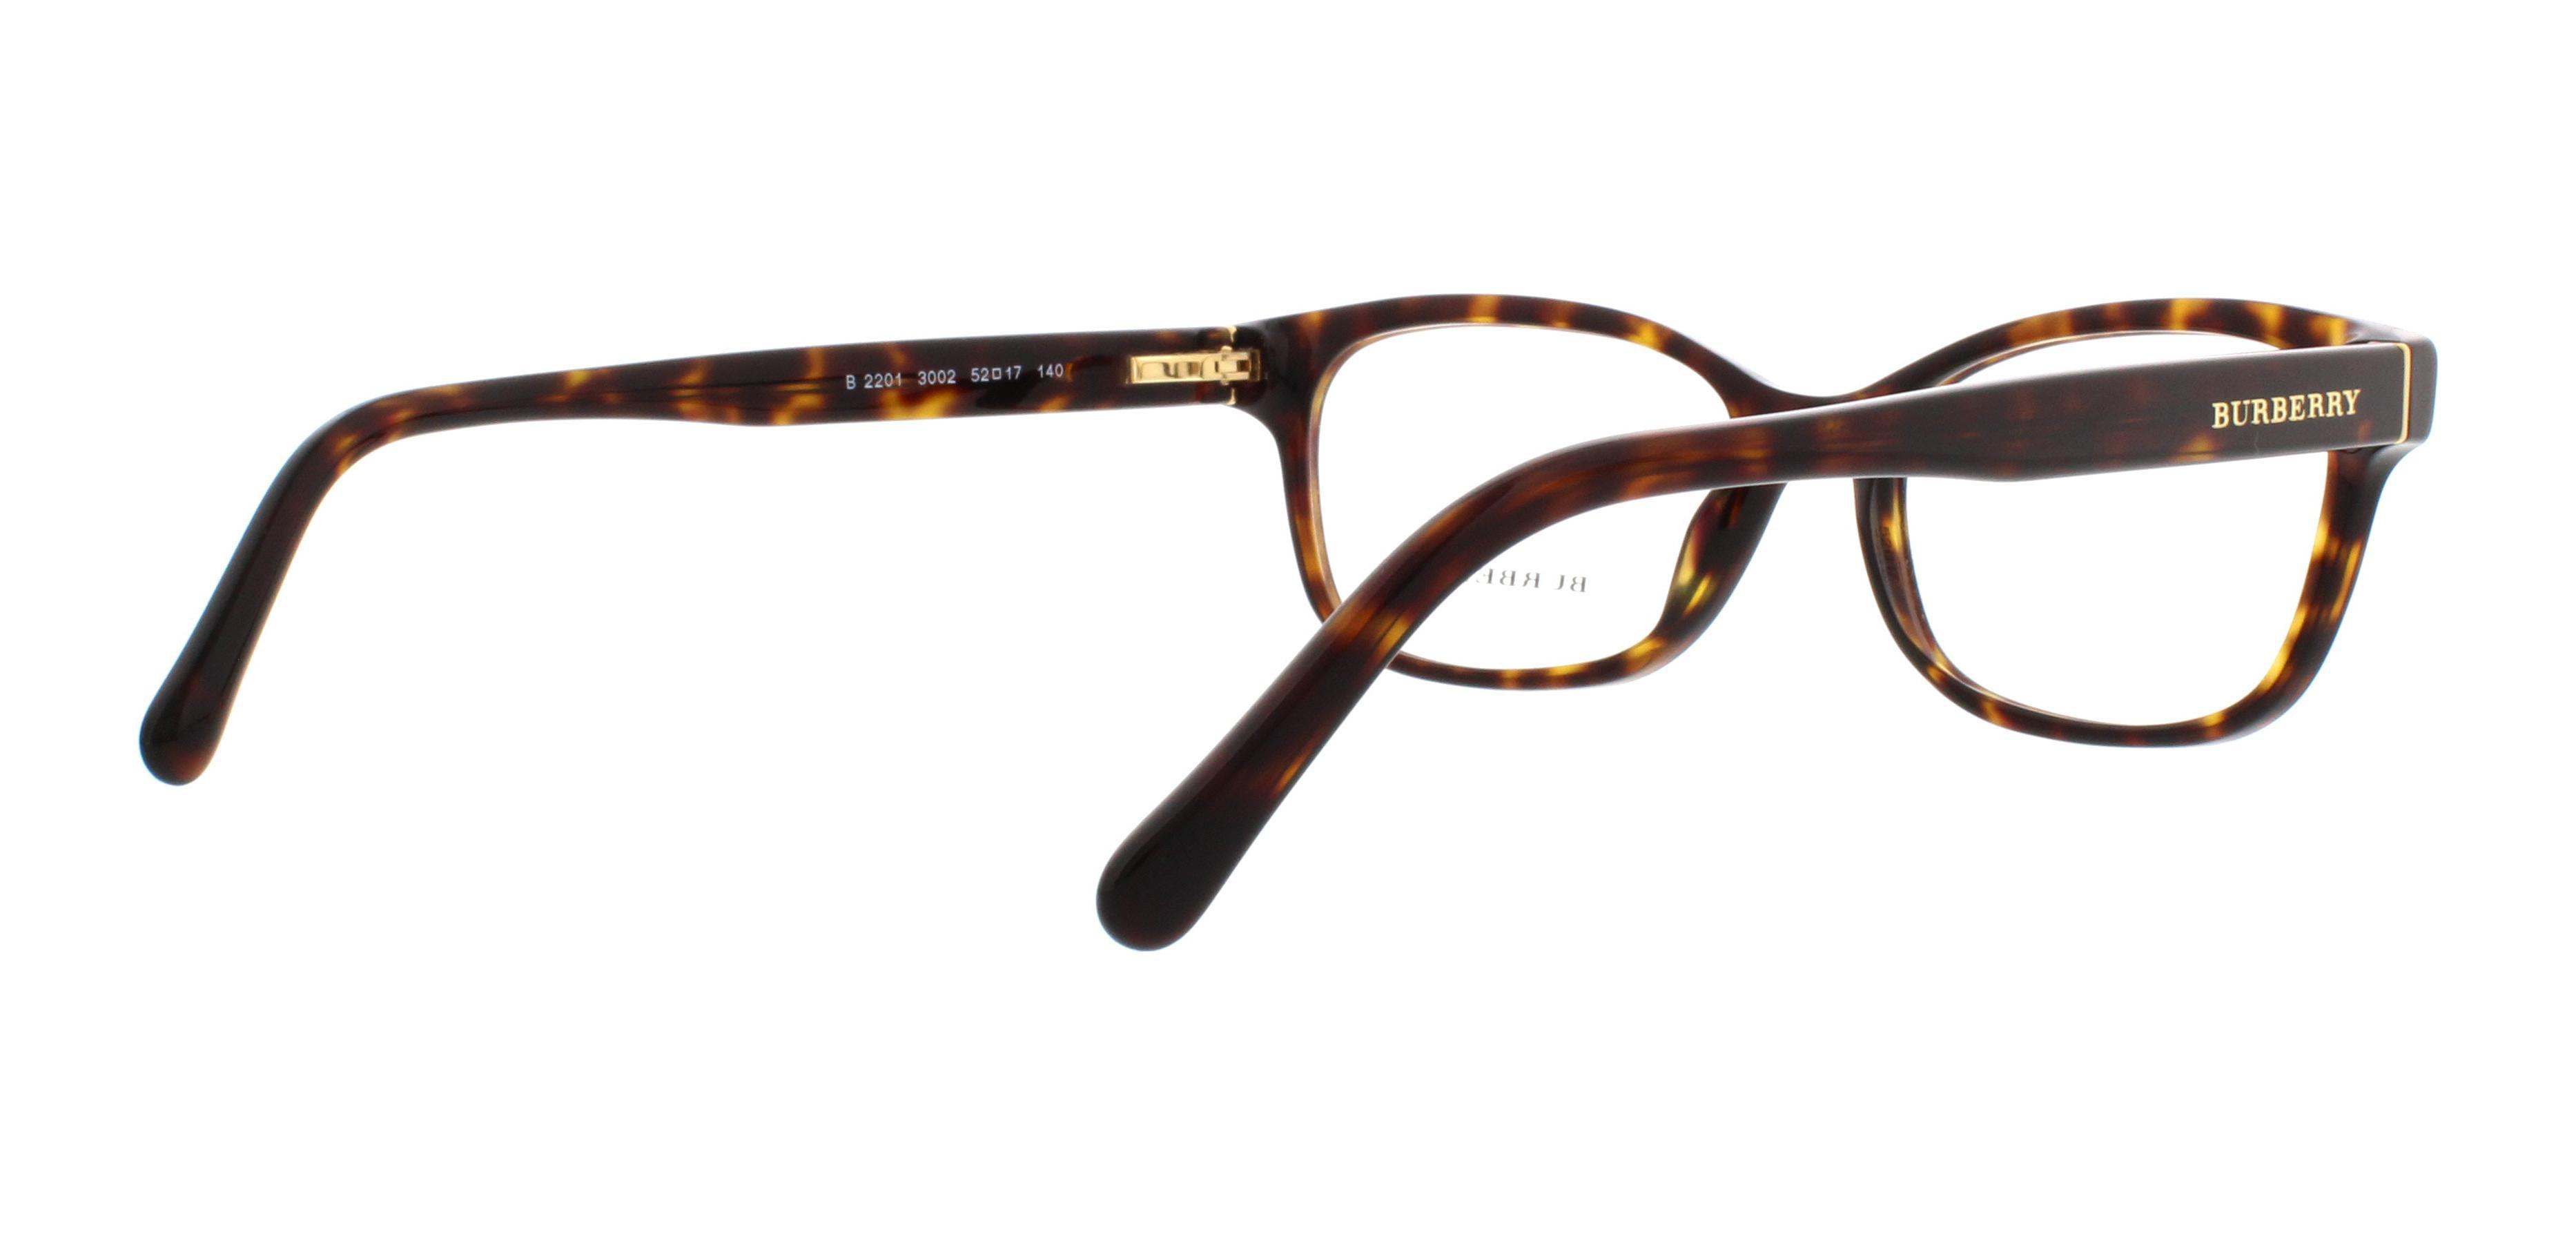 7d1a1bd6c8b BURBERRY Eyeglasses BE2201 3002 Havana 52MM - Walmart.com